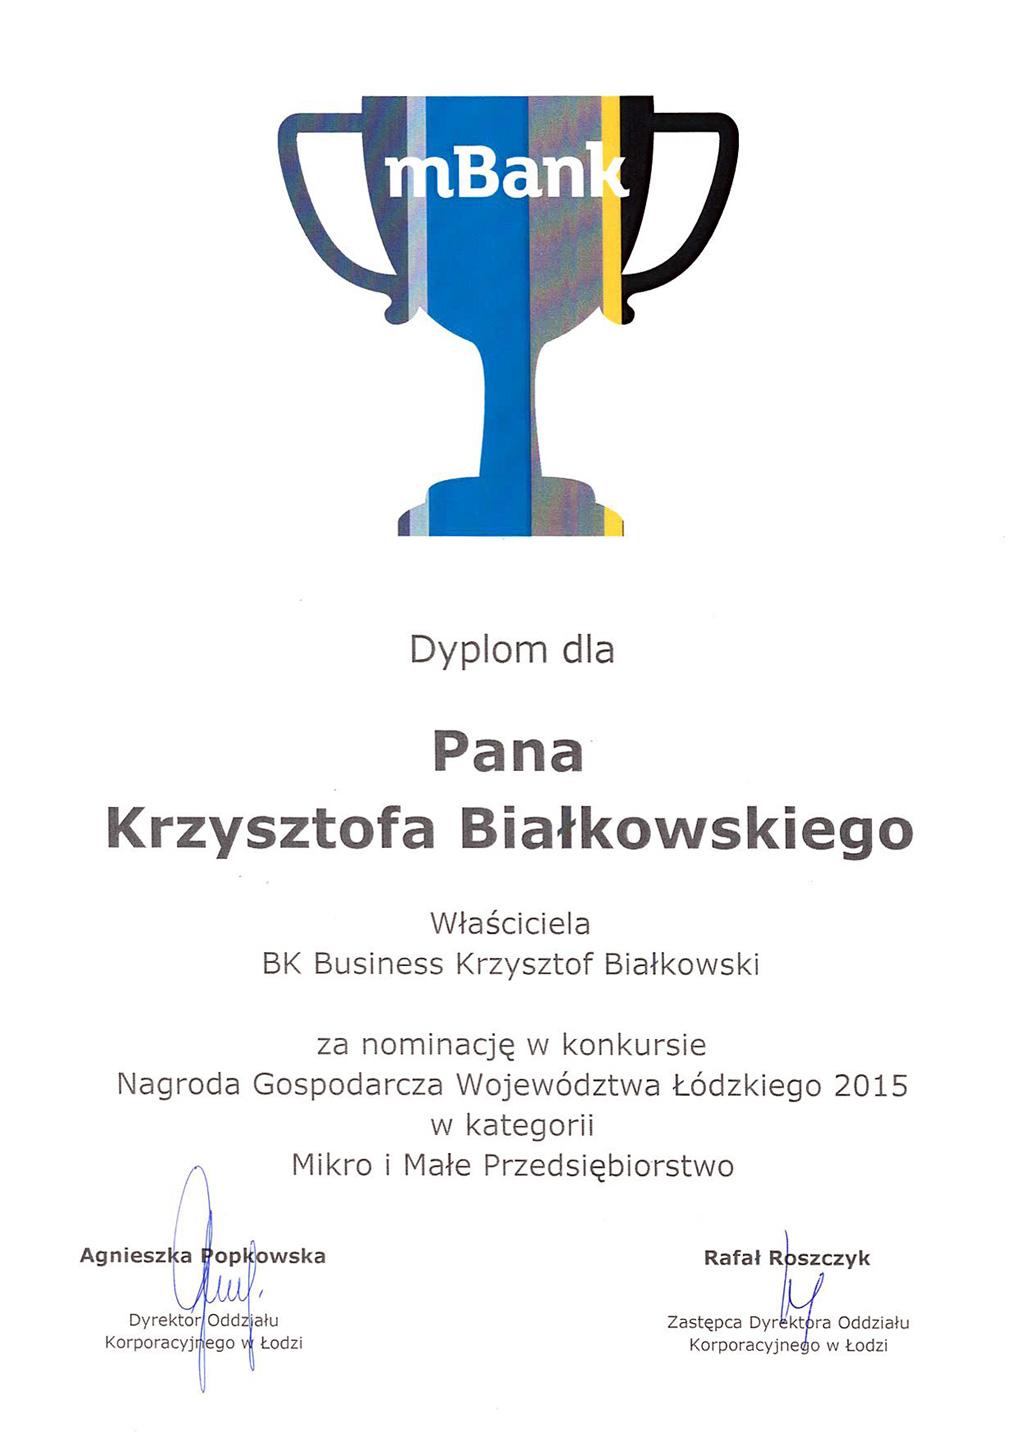 Dyplom uznania od mBanku